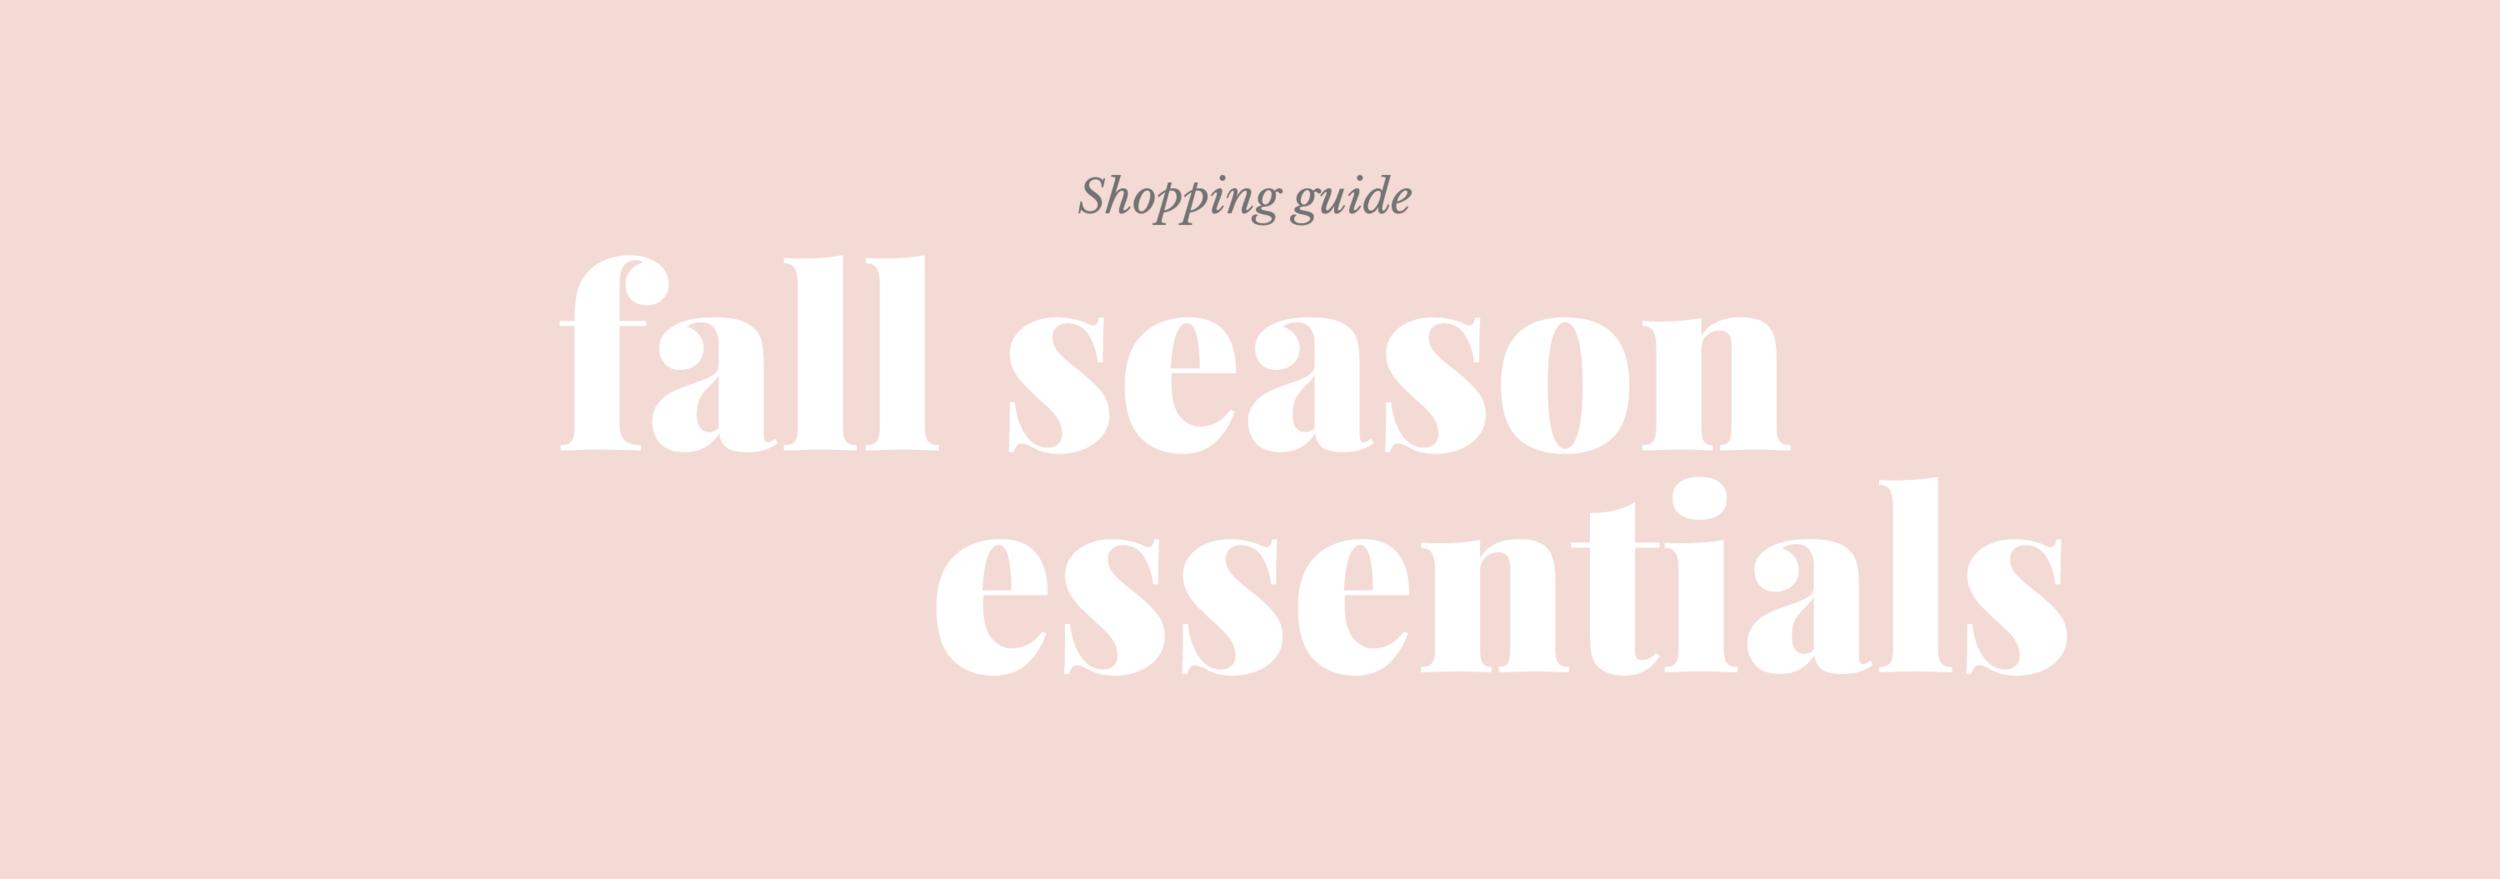 Fall Season Essentials Shopping Guide.png